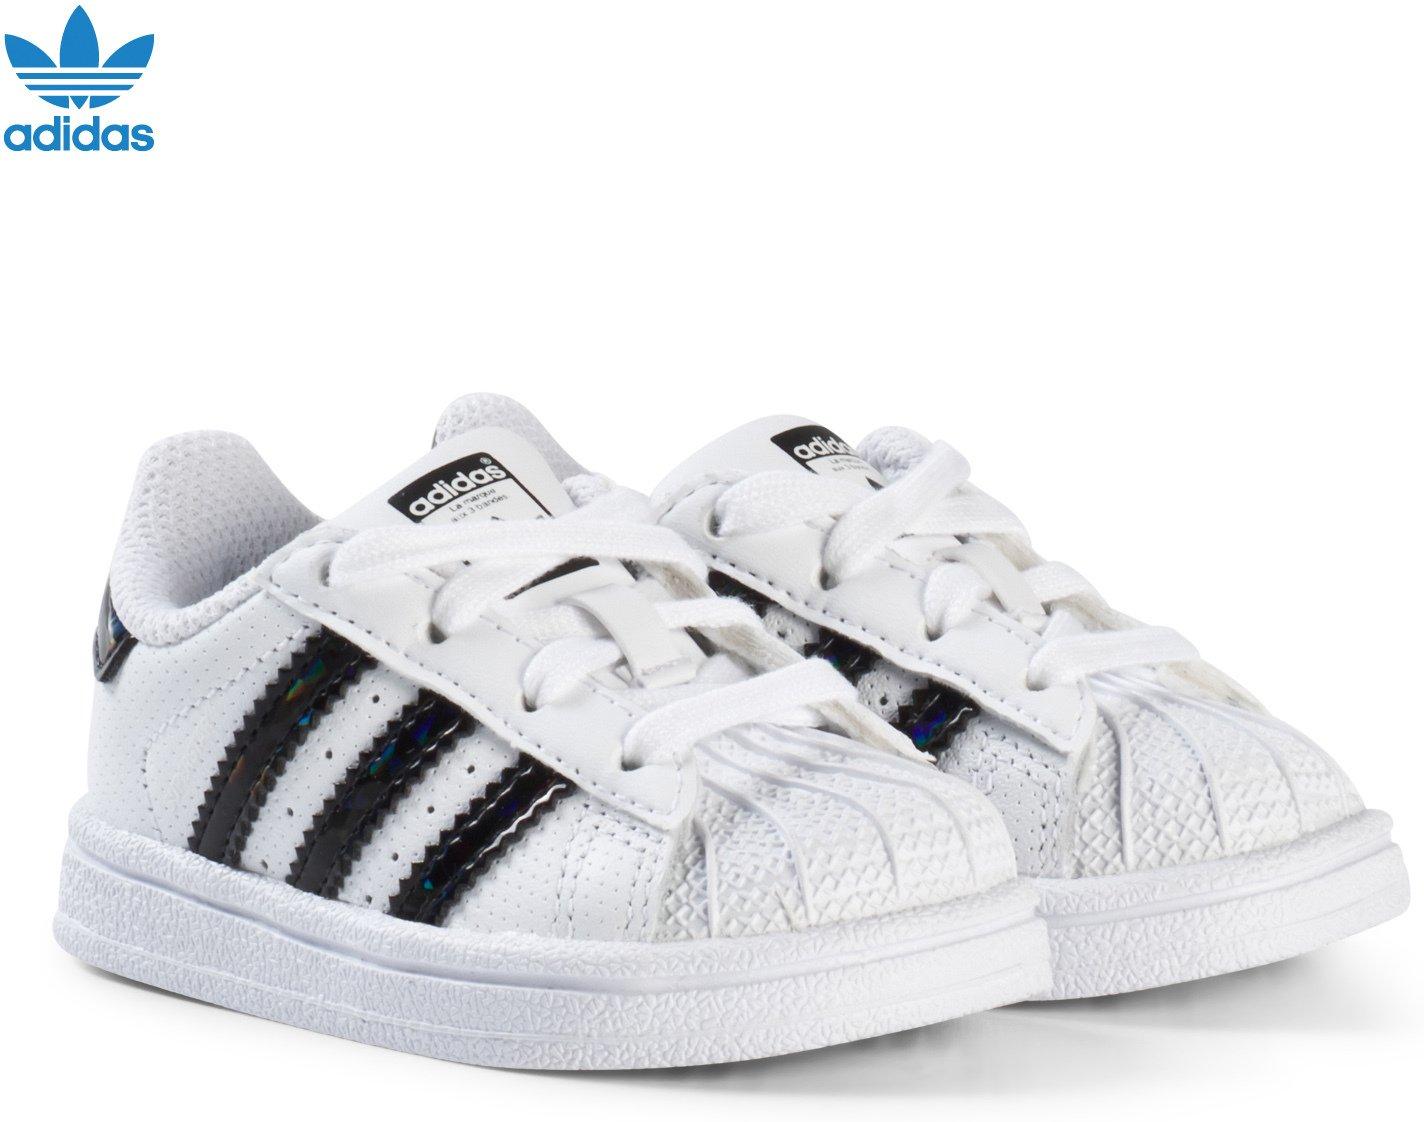 adidas superstar sko størrelse, Adidas skateboarding sko